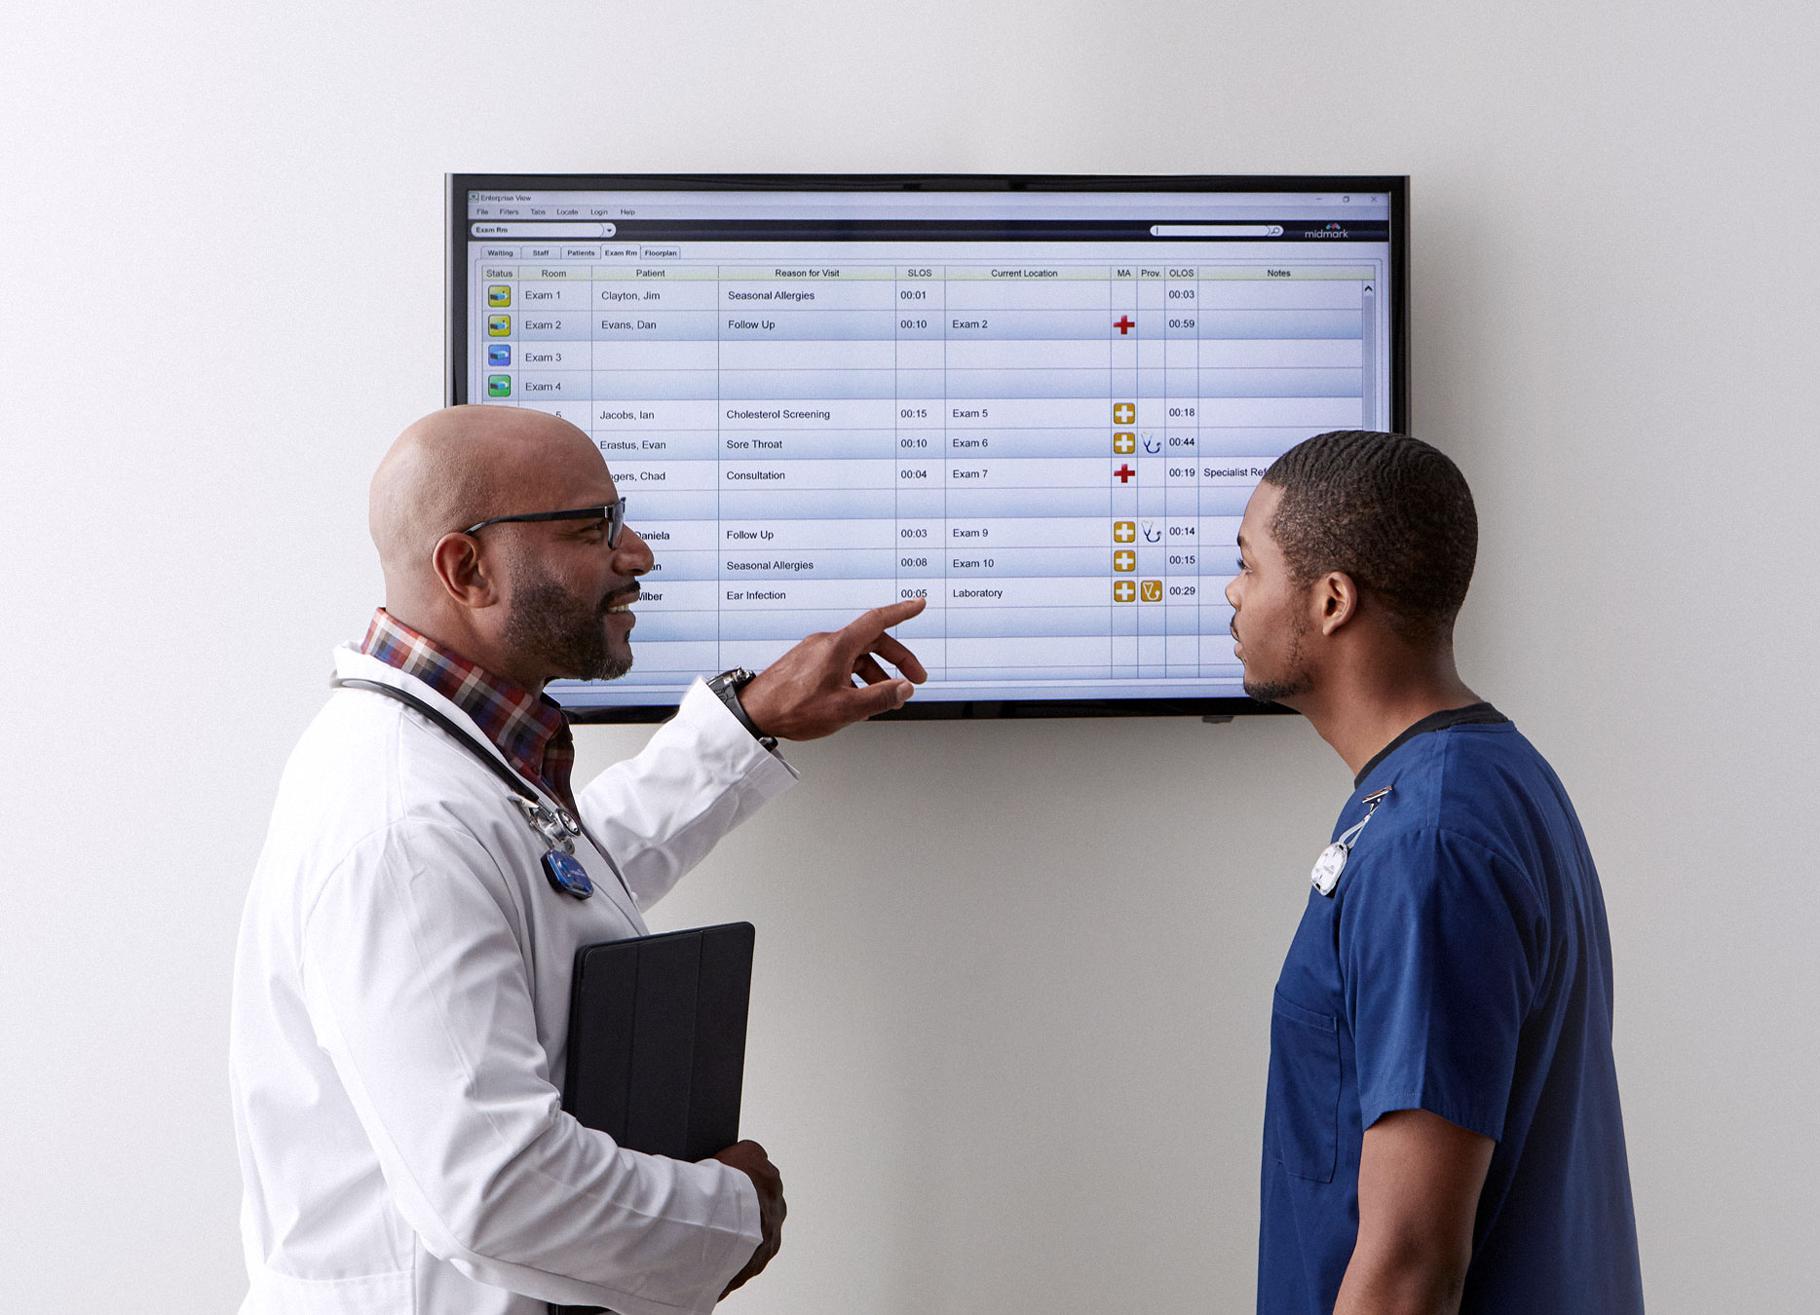 Ronco Healthcare-Grade TVs